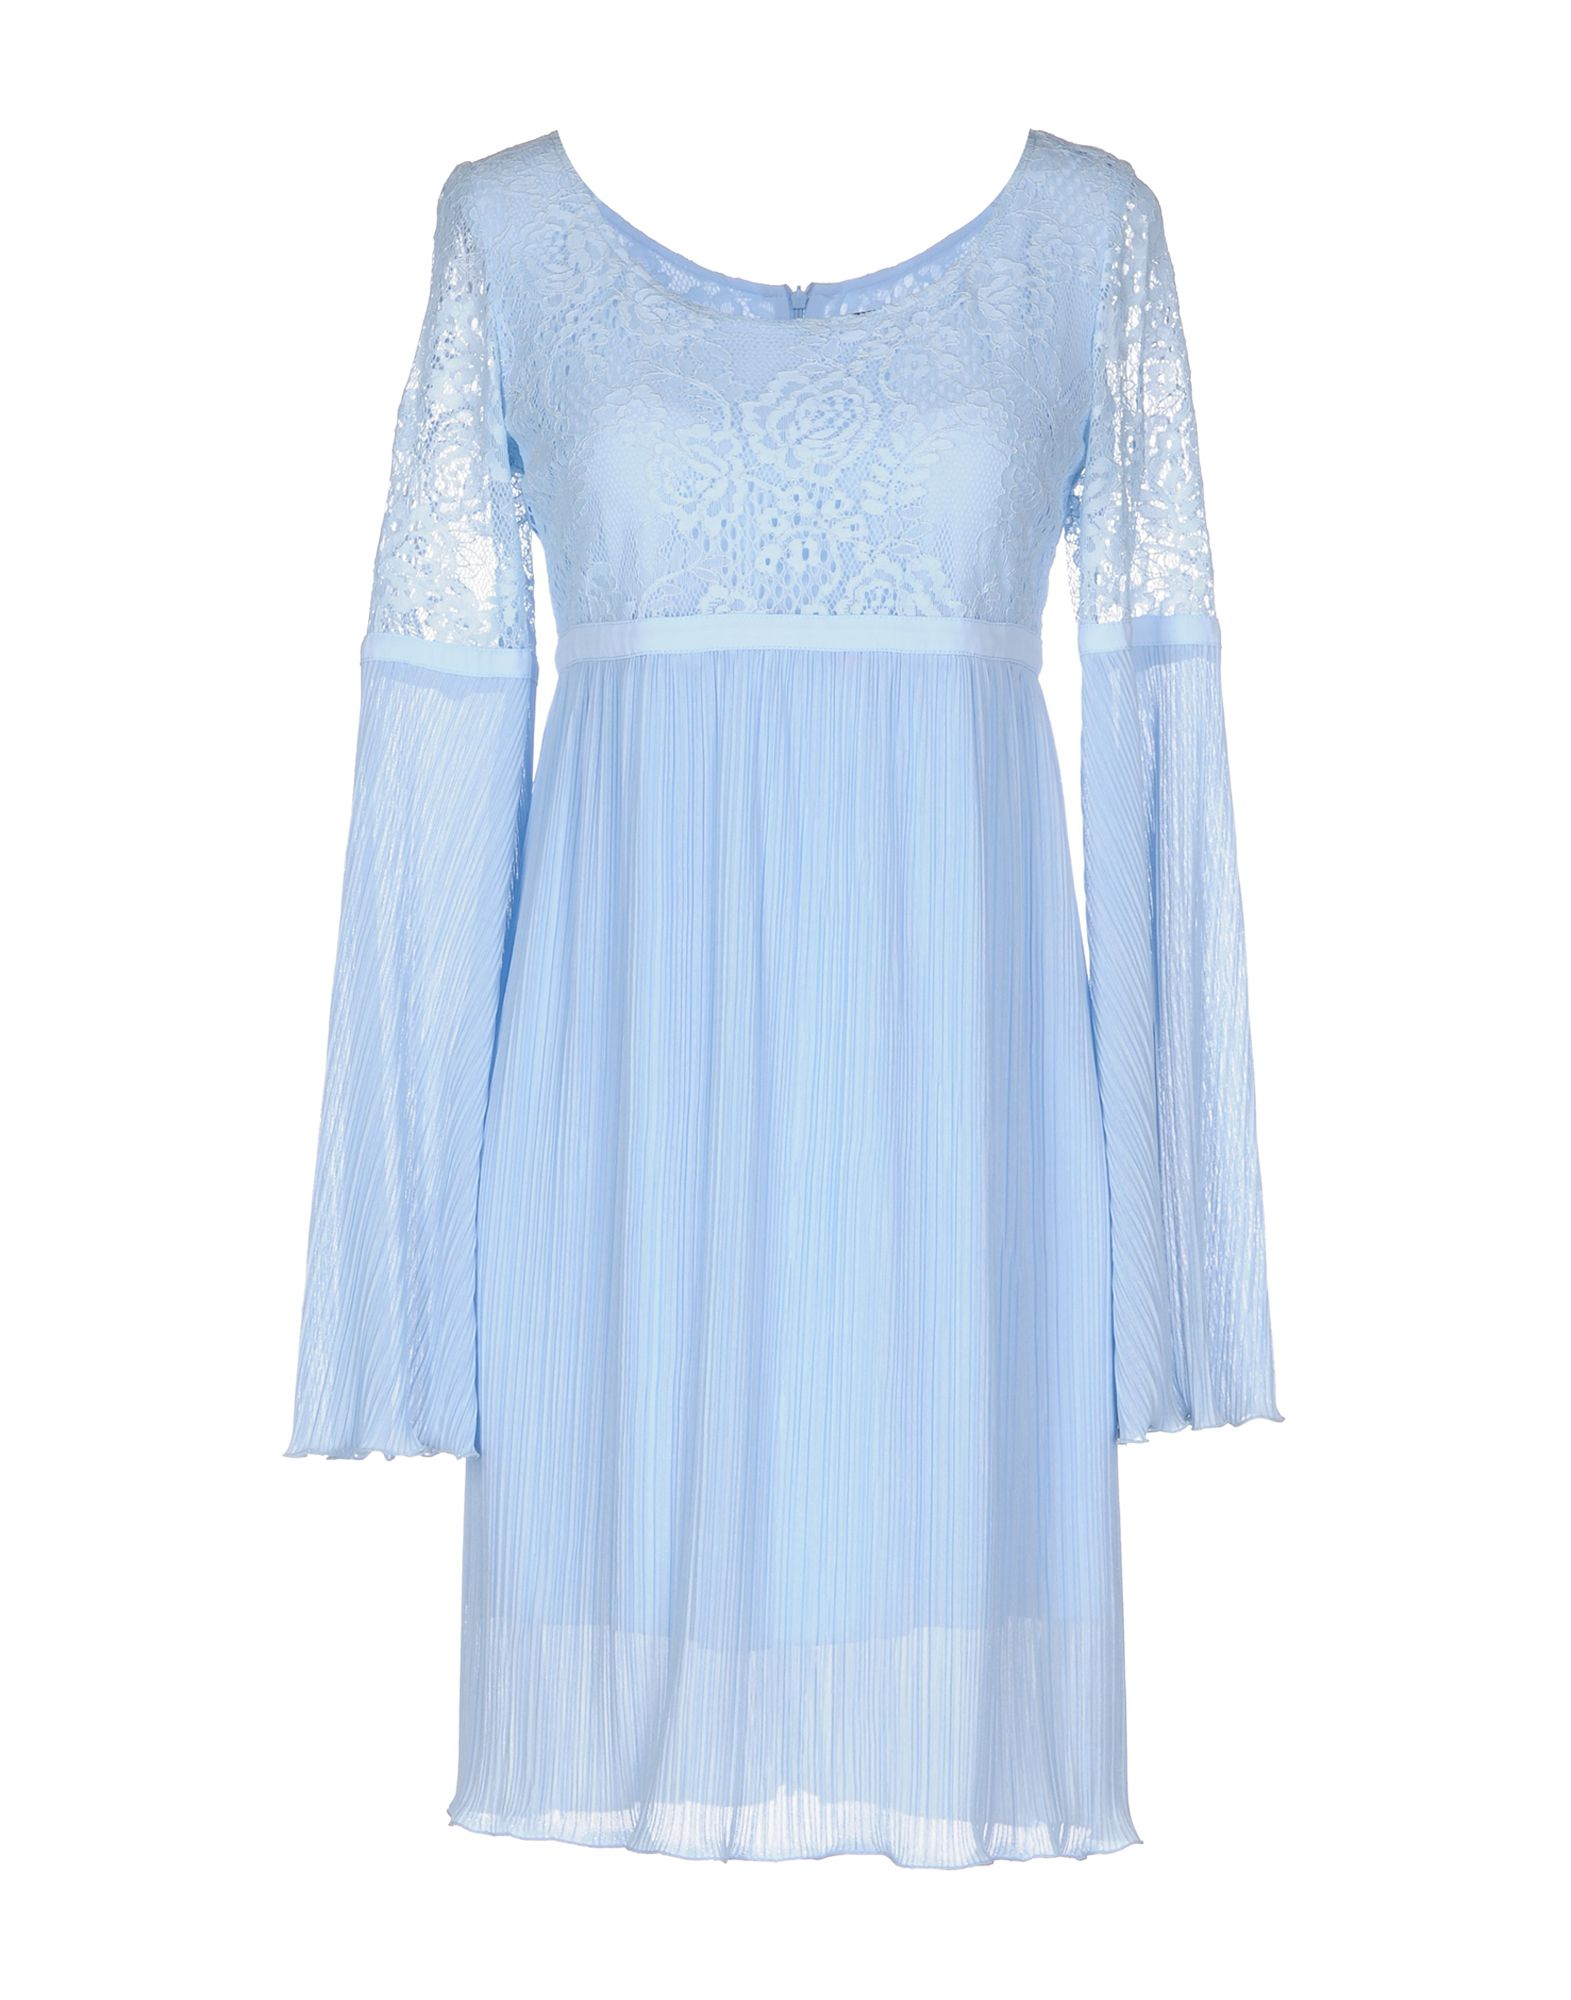 IT'S A PARTY DRESS Короткое платье женское платье a line slim dresses girls ladies shealth dress для live show party dancing